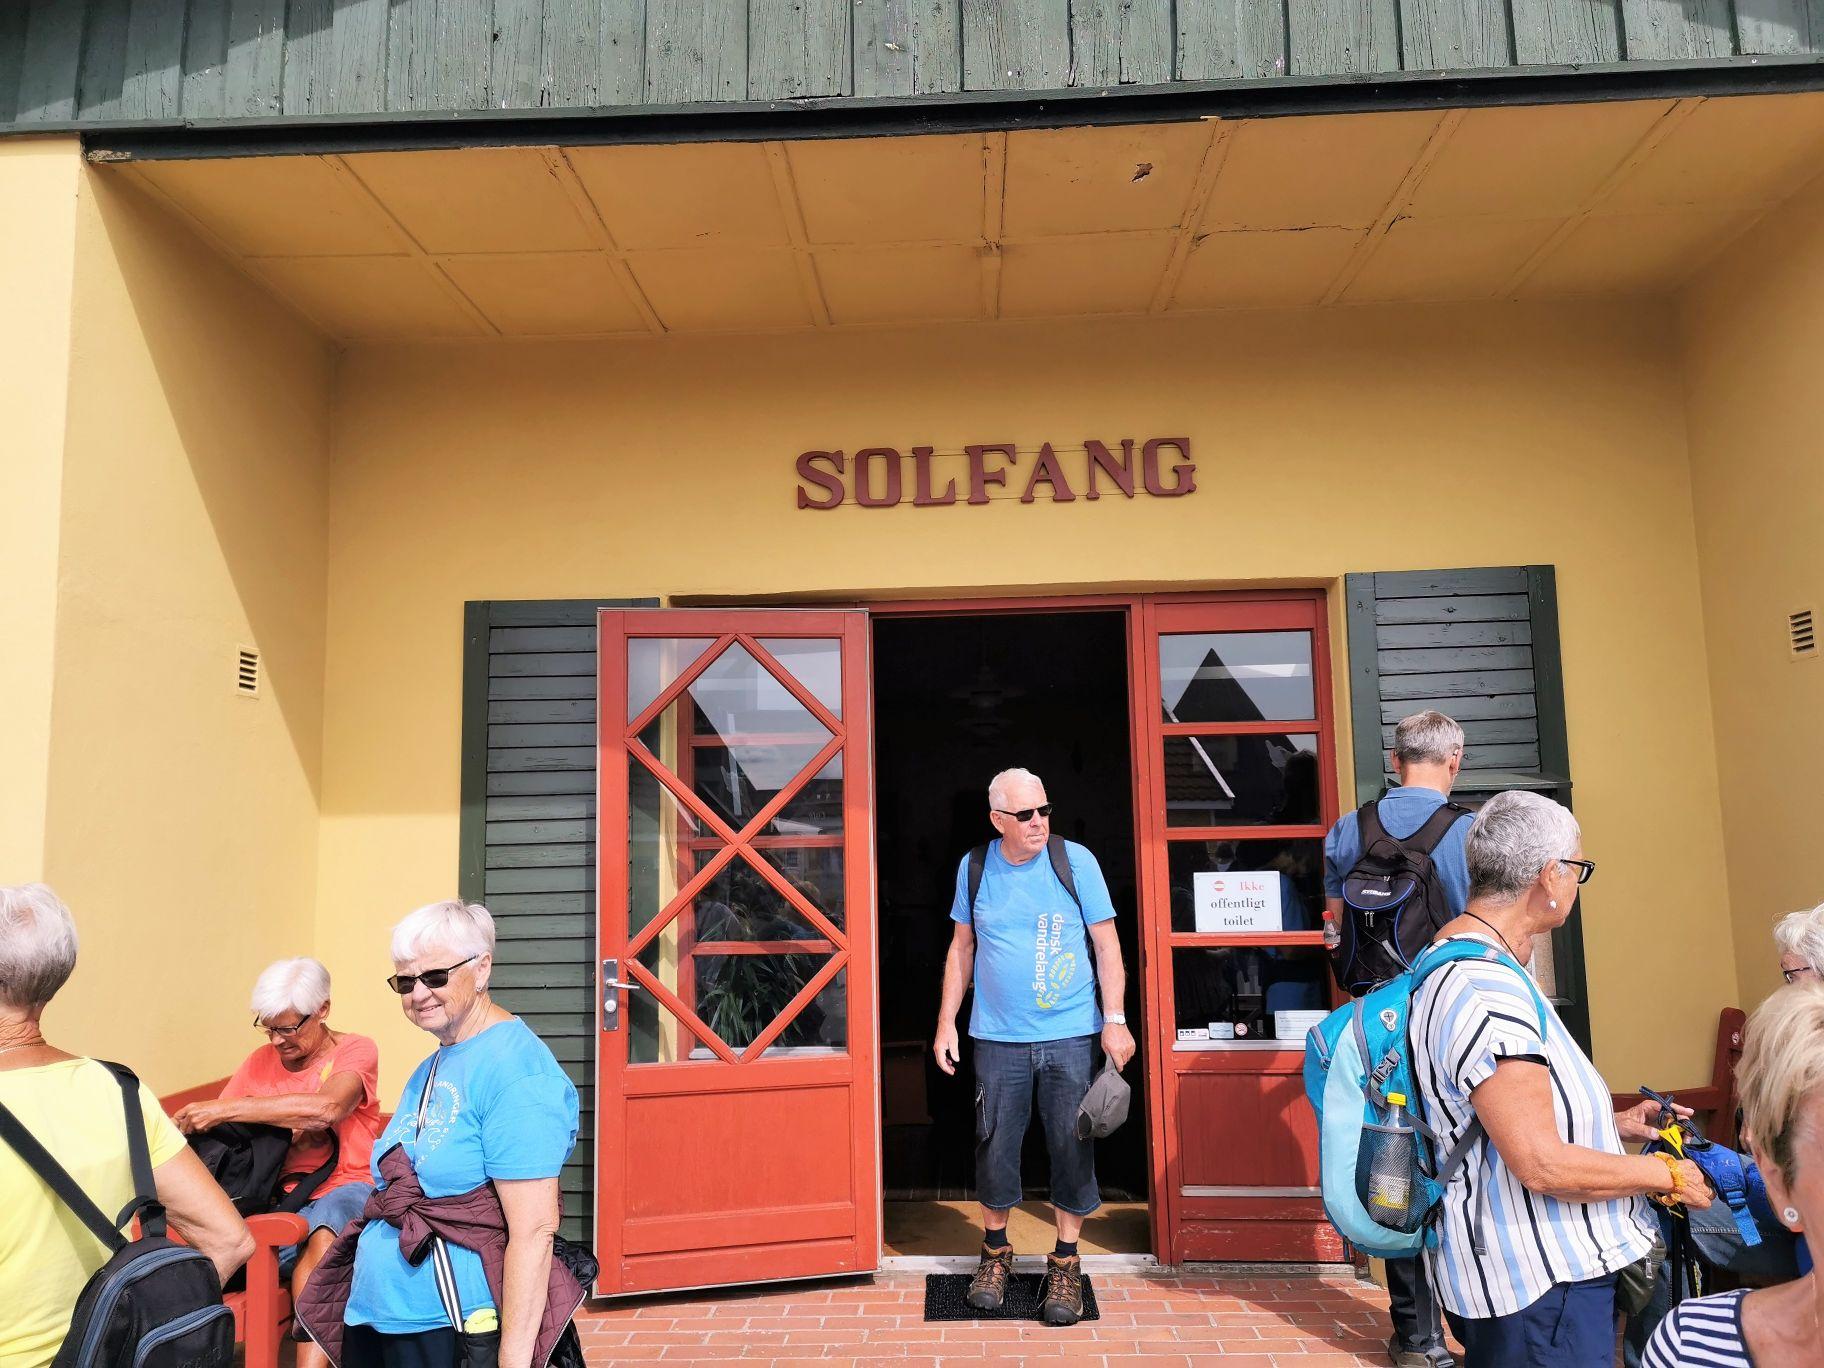 Esbjerg-tur til vandrerhjemmet Solfang. Foto Jens Andreas Pedersen (17)